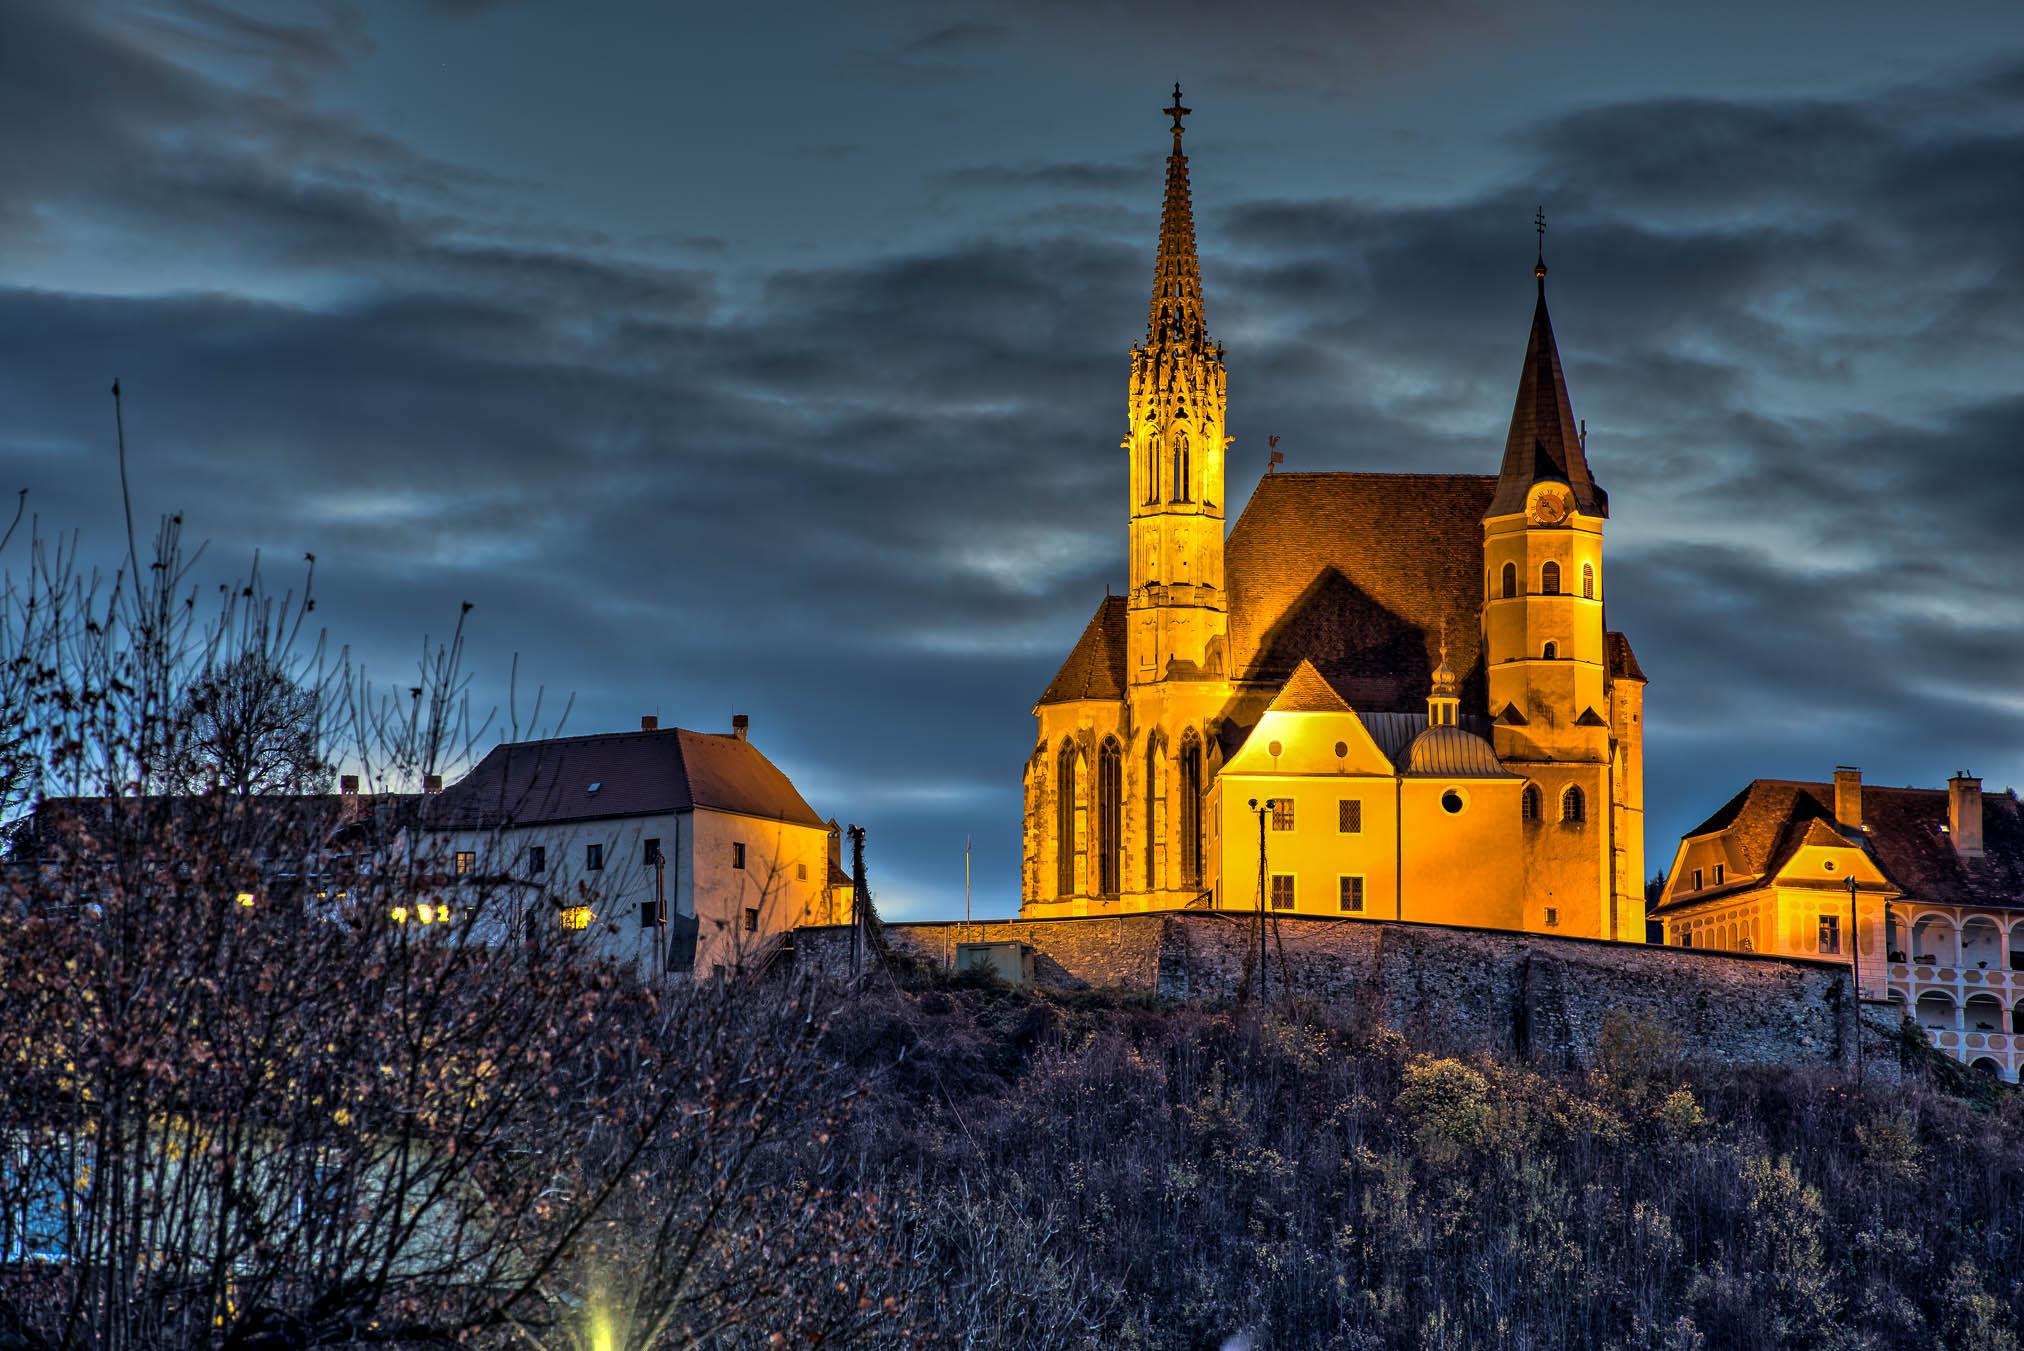 Judendorf-Straßengel, Austria